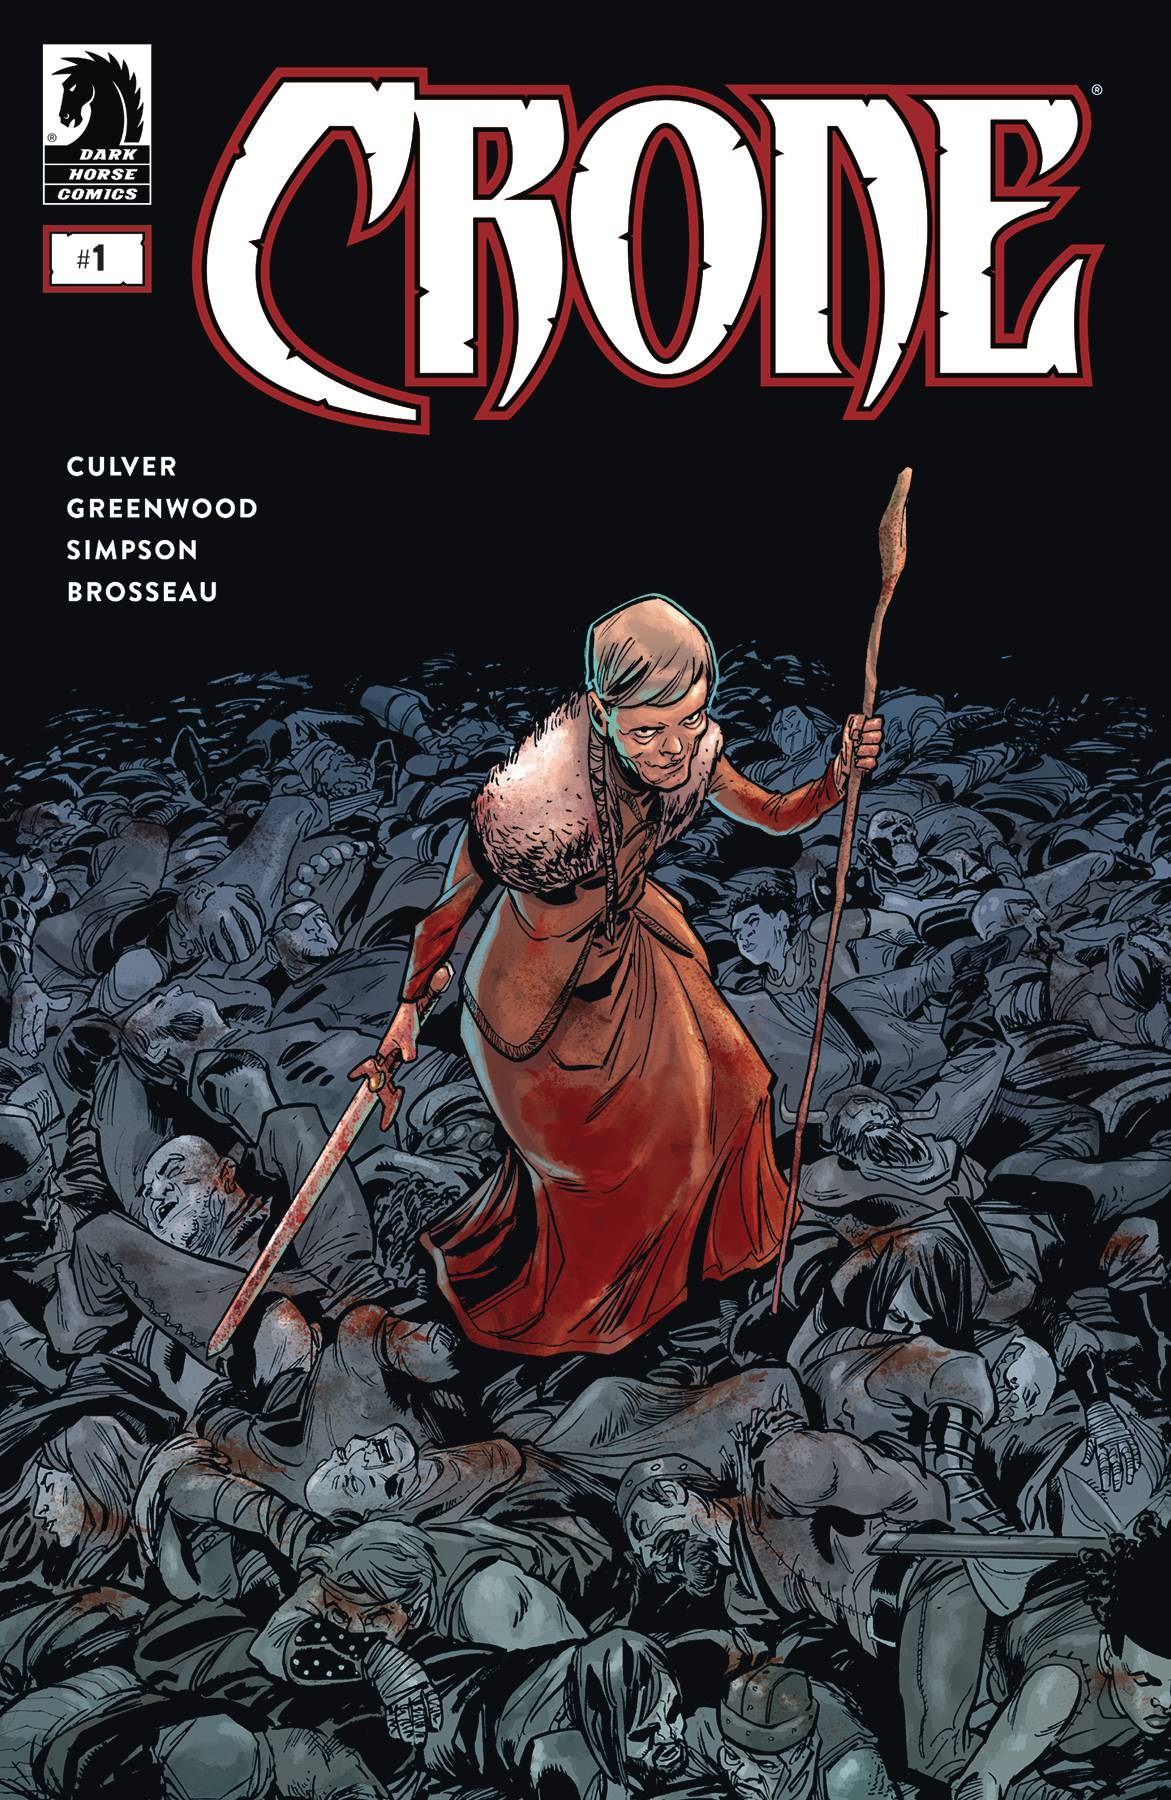 Crone #1 (2019)